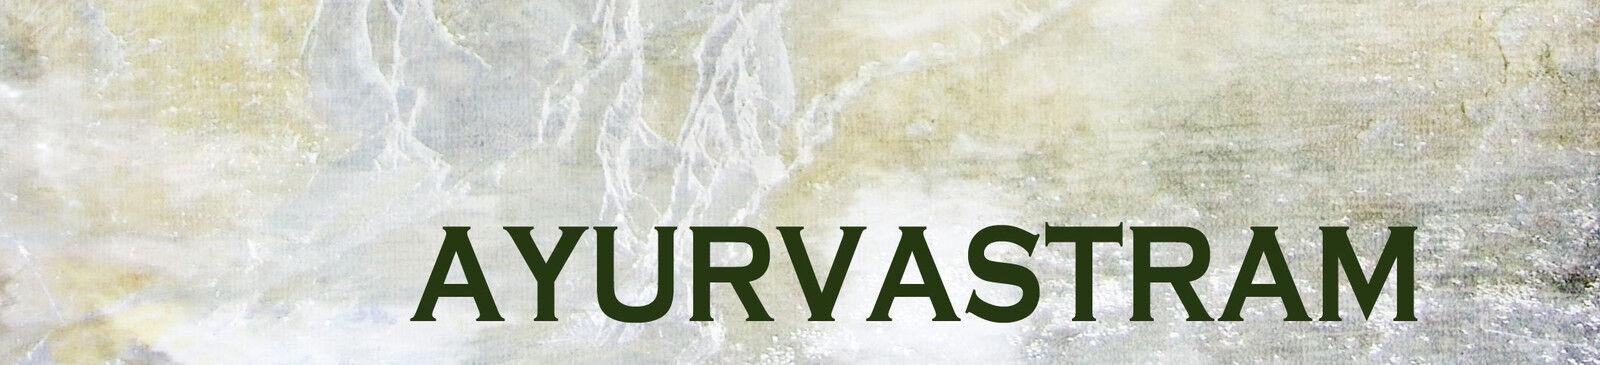 Ayurvastram